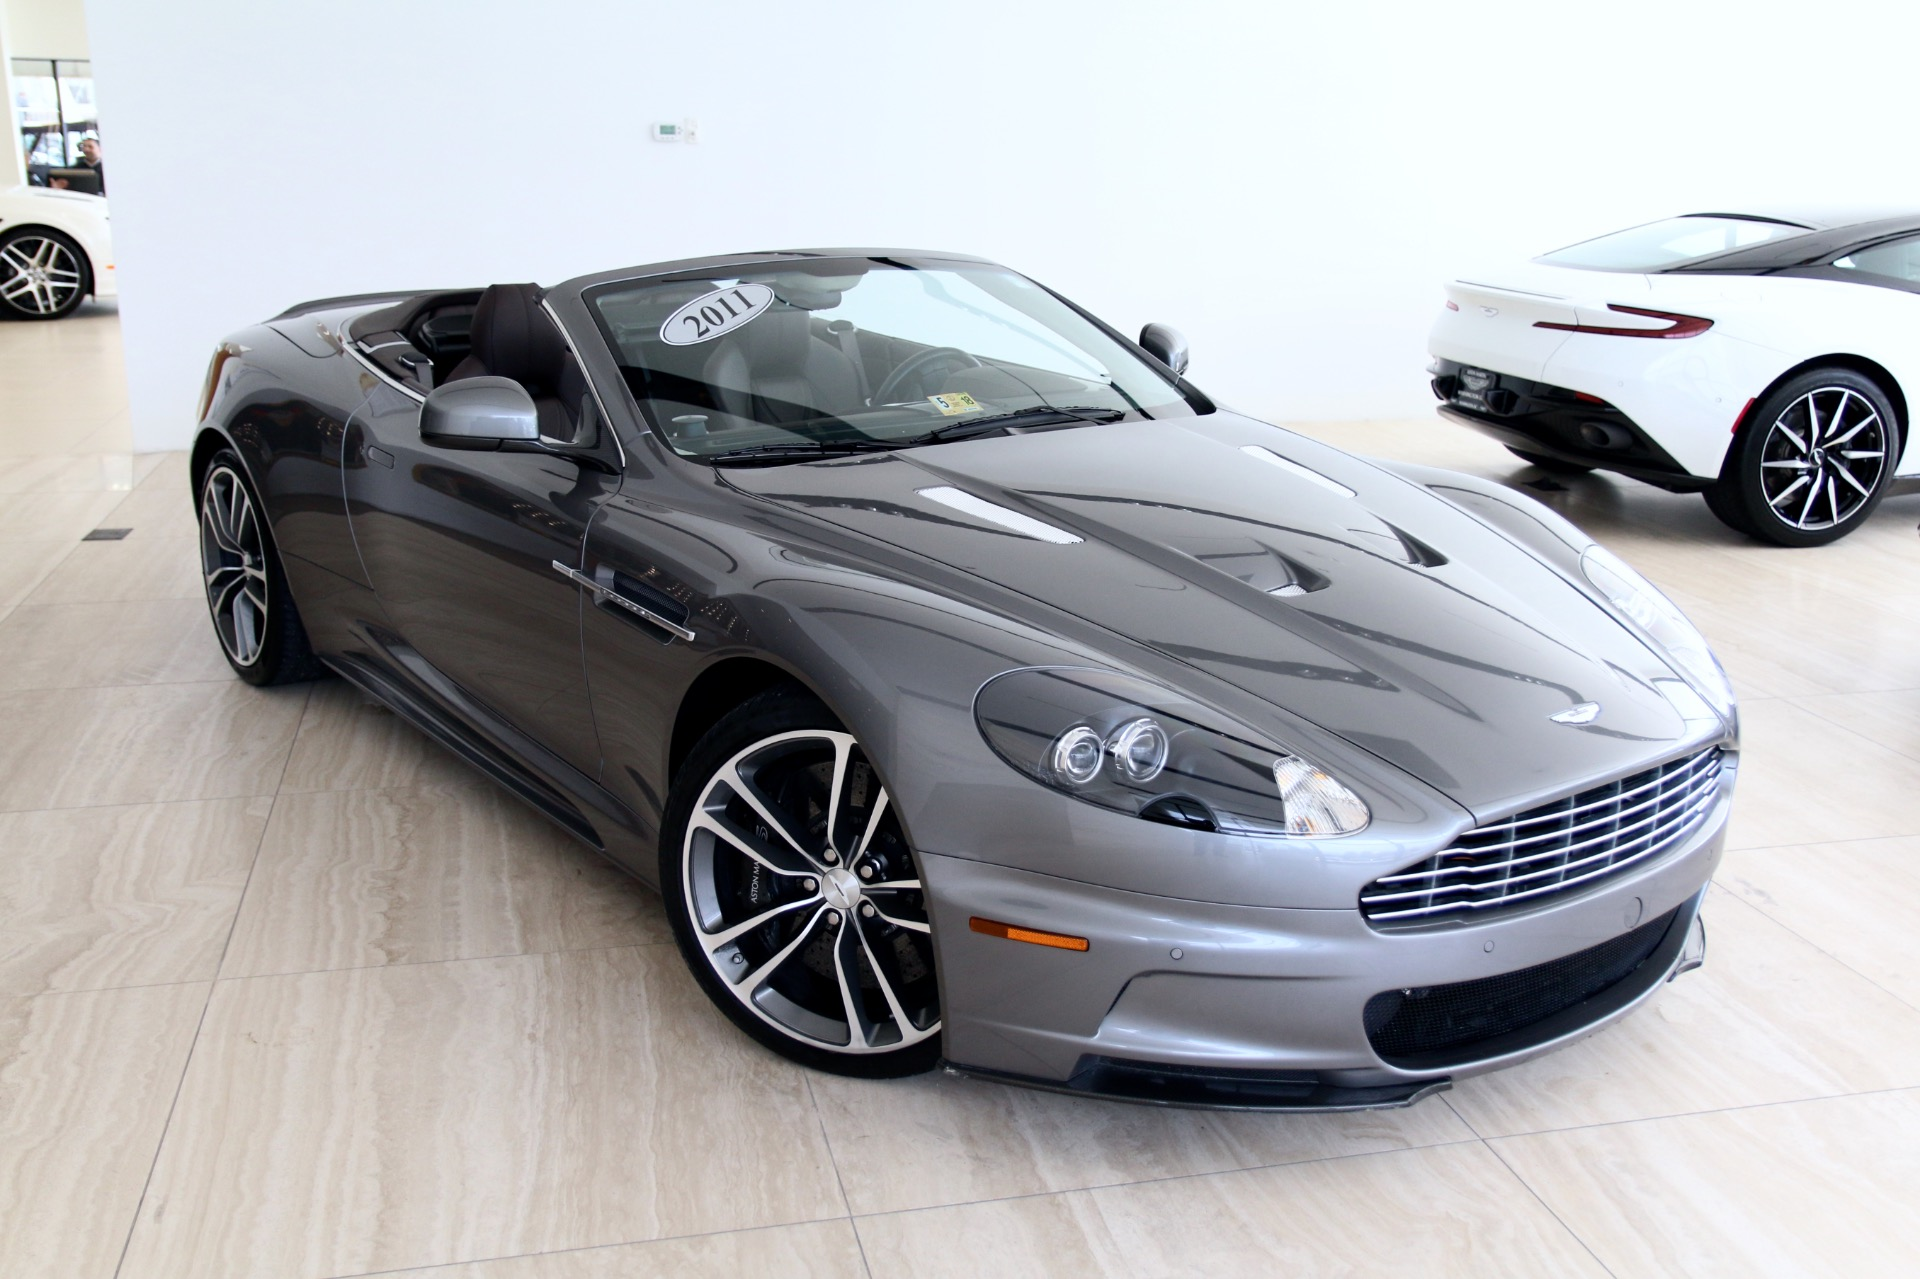 Aston Martin DBS Volante Stock NLA For Sale Near Vienna - Aston martin dbs for sale